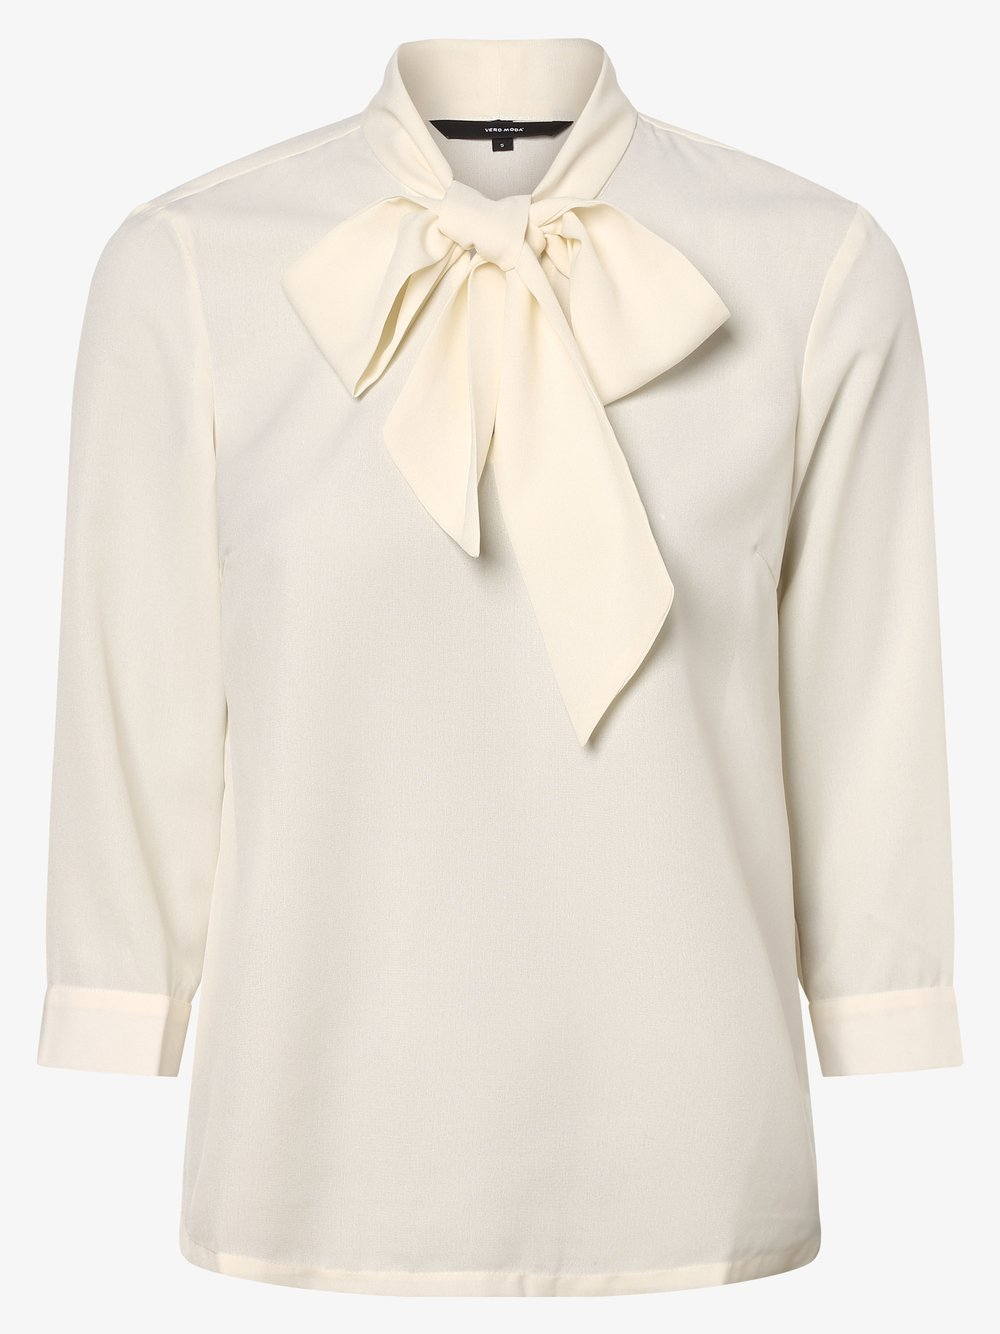 Vero Moda – Bluzka damska – Vmmille, beżowy Van Graaf 461909-0001